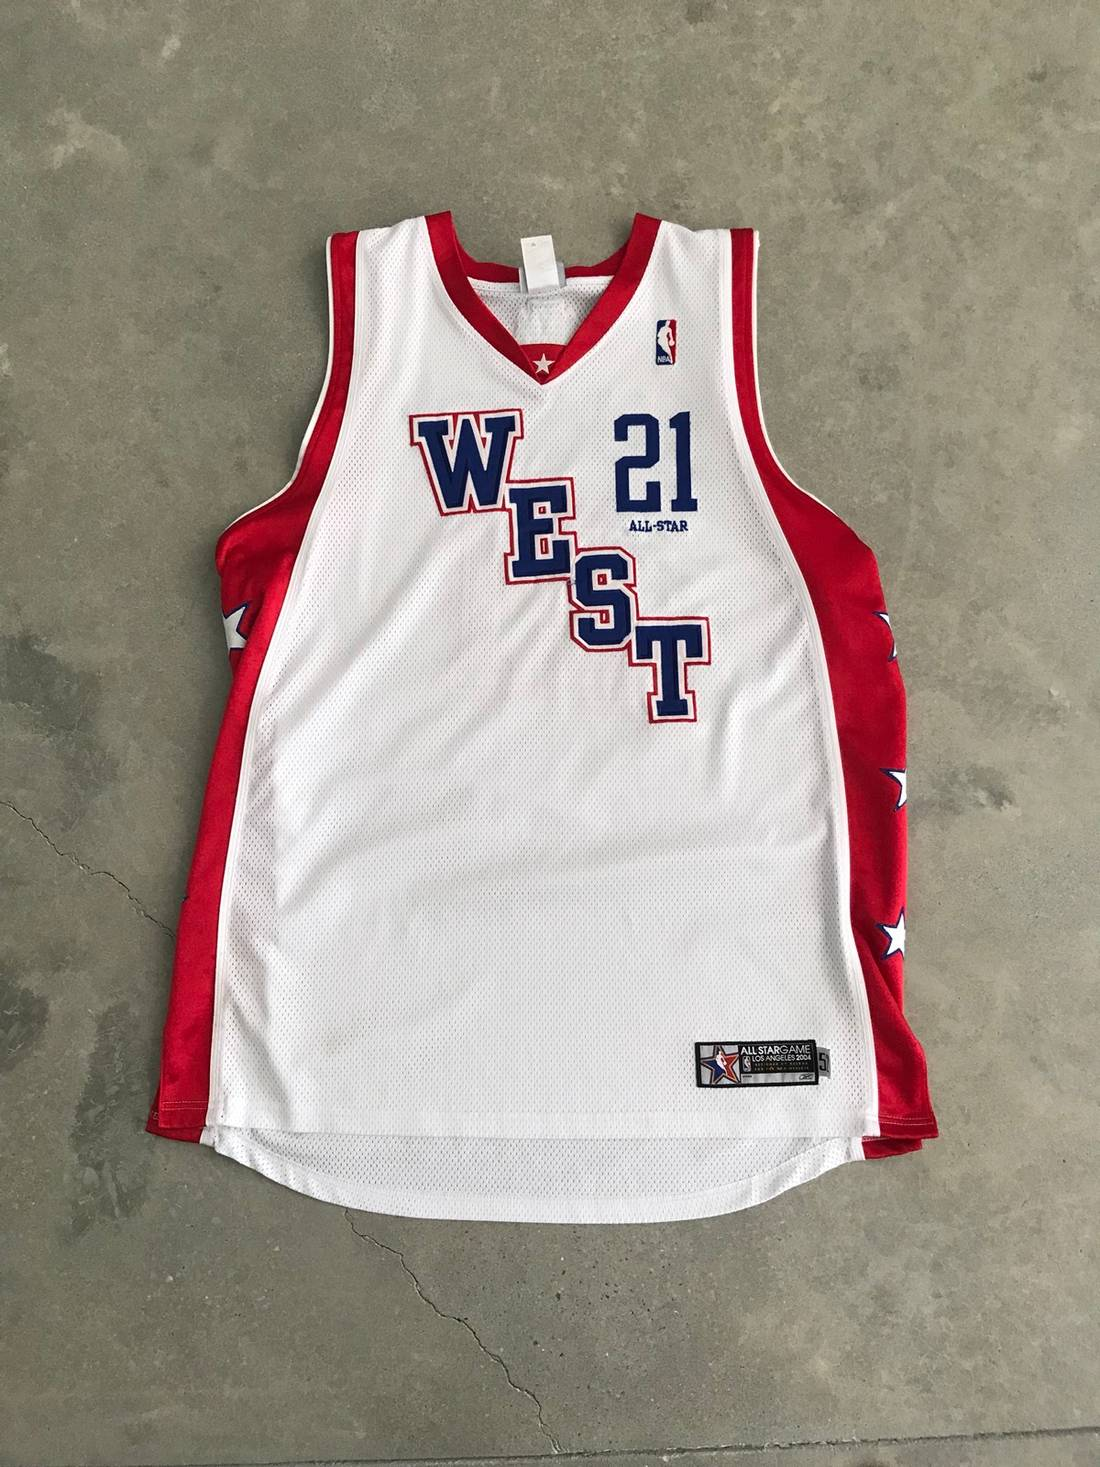 Nike Kevin Garnett All Star Jersey Timberwolves Size US L EU 52- ... 2a7264991